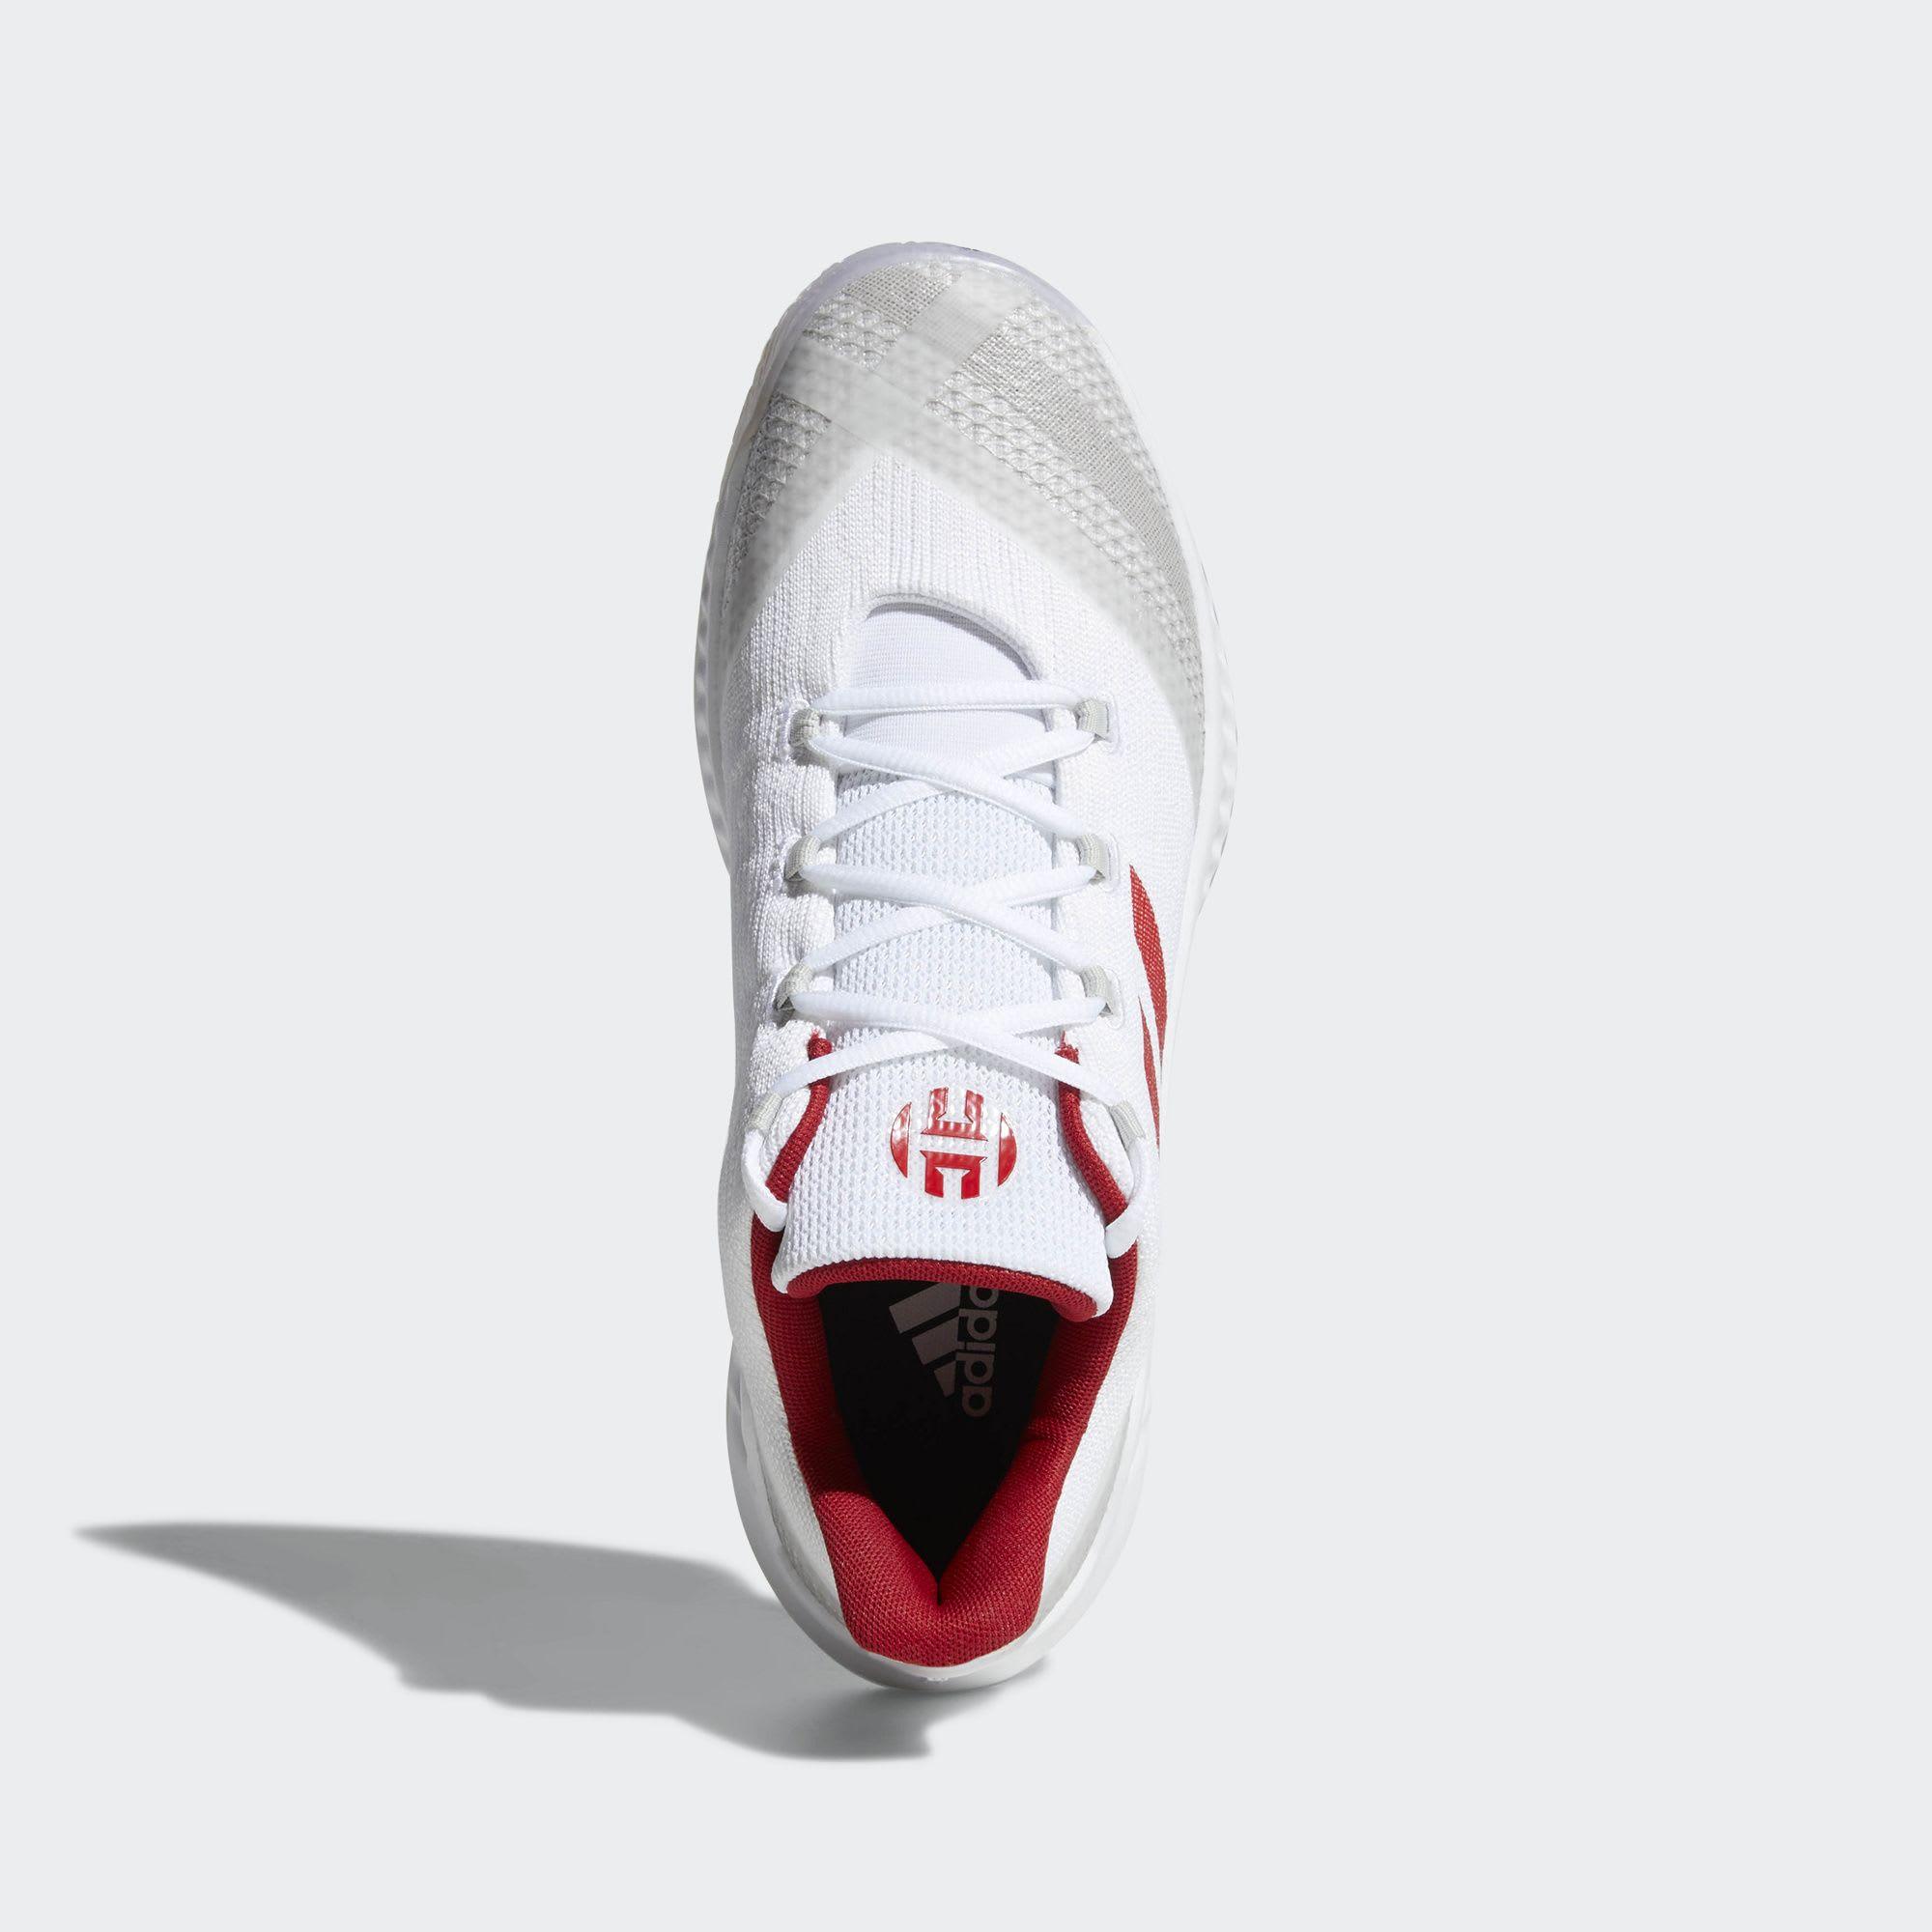 ... clearance adidas harden b e 2 white red top 5ac74 f61fa 87b3f8aba